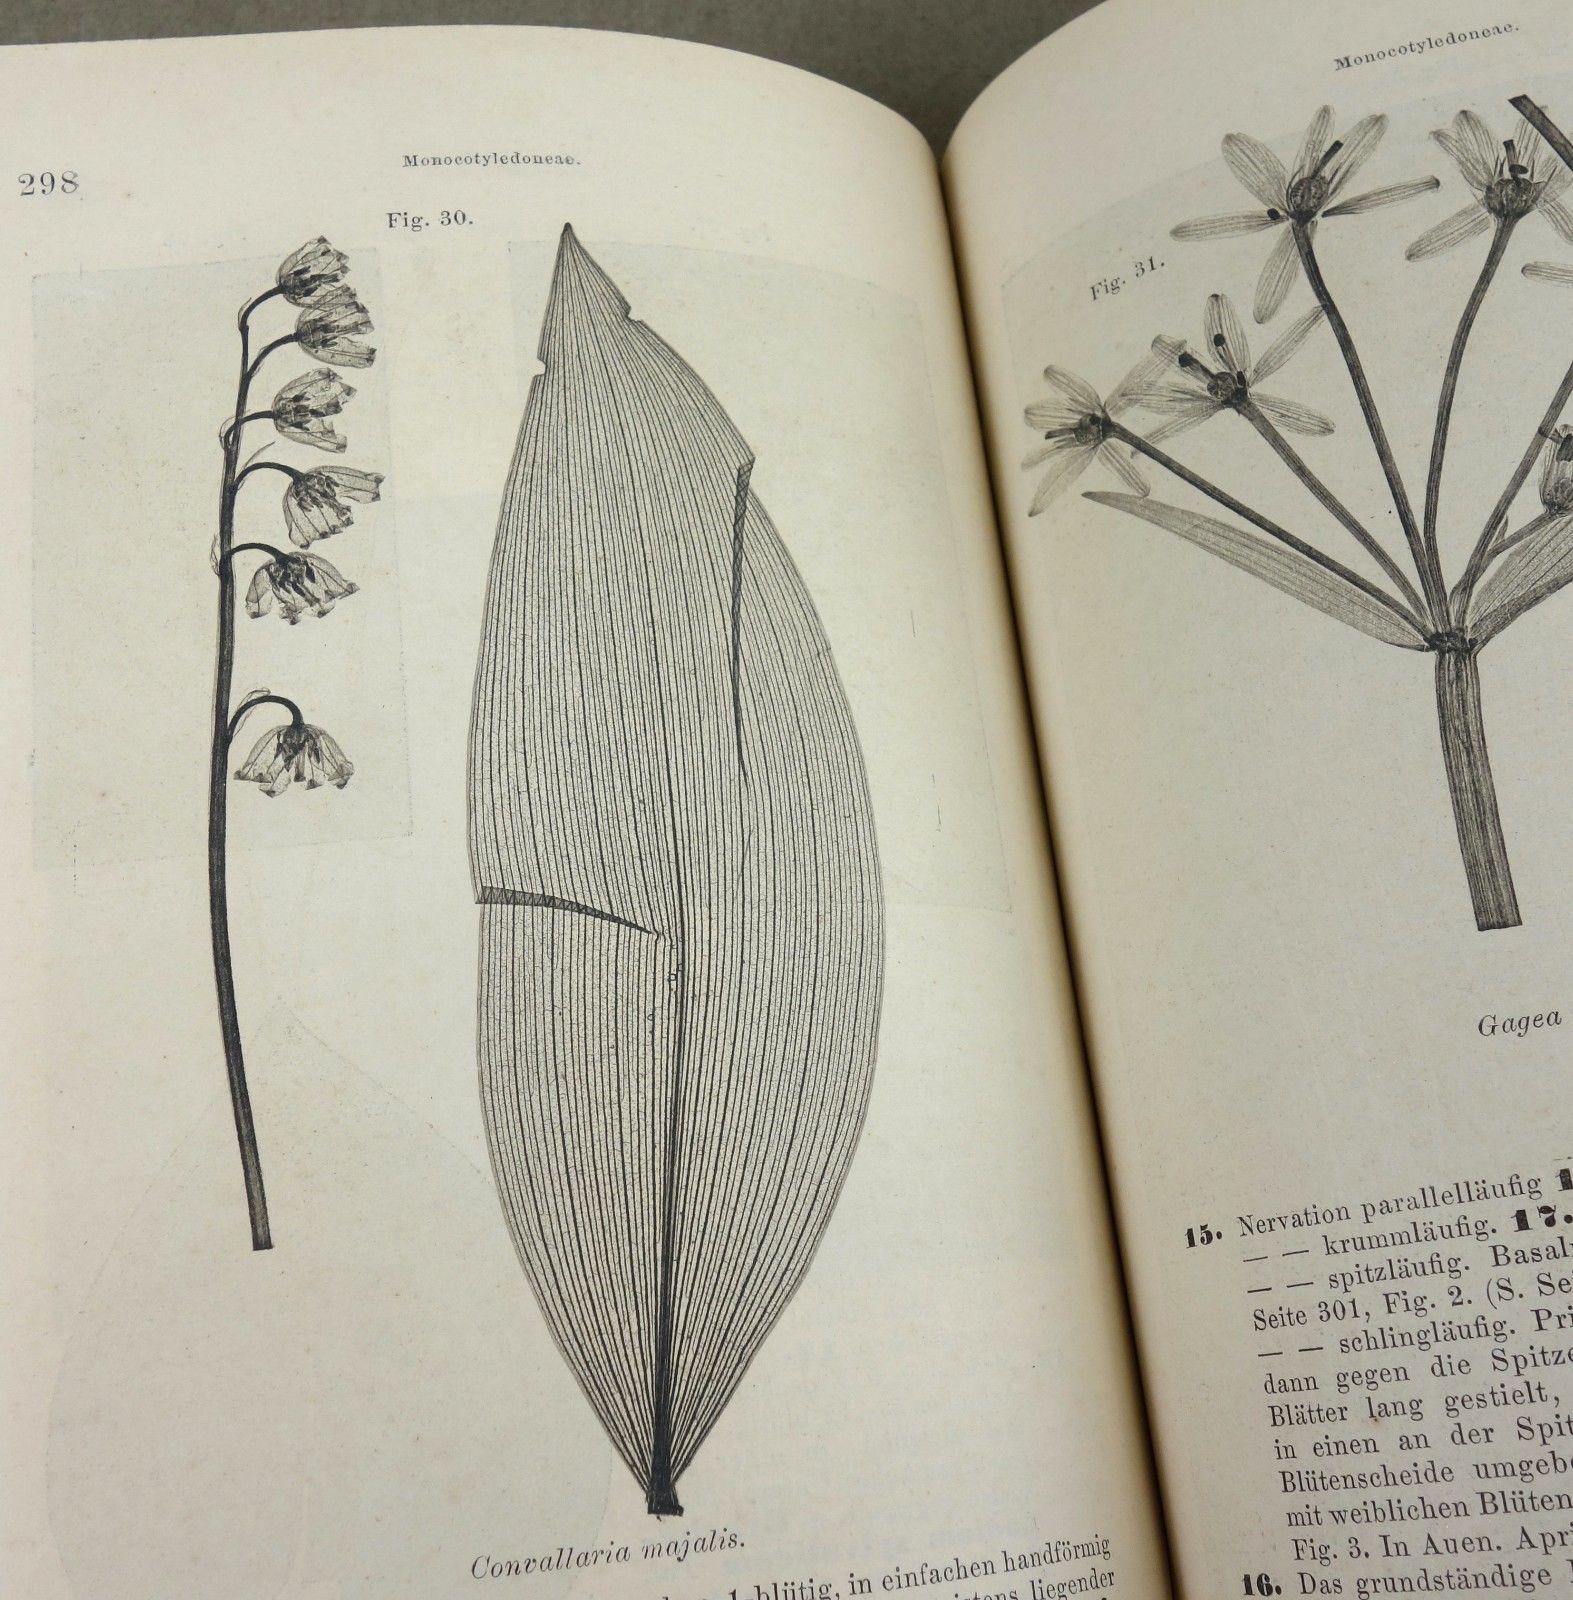 1862 - BOTANIK - Medizinalpflanzen - PHARMAZIE Kräuterbuch Gift Giftpflanzen RAR